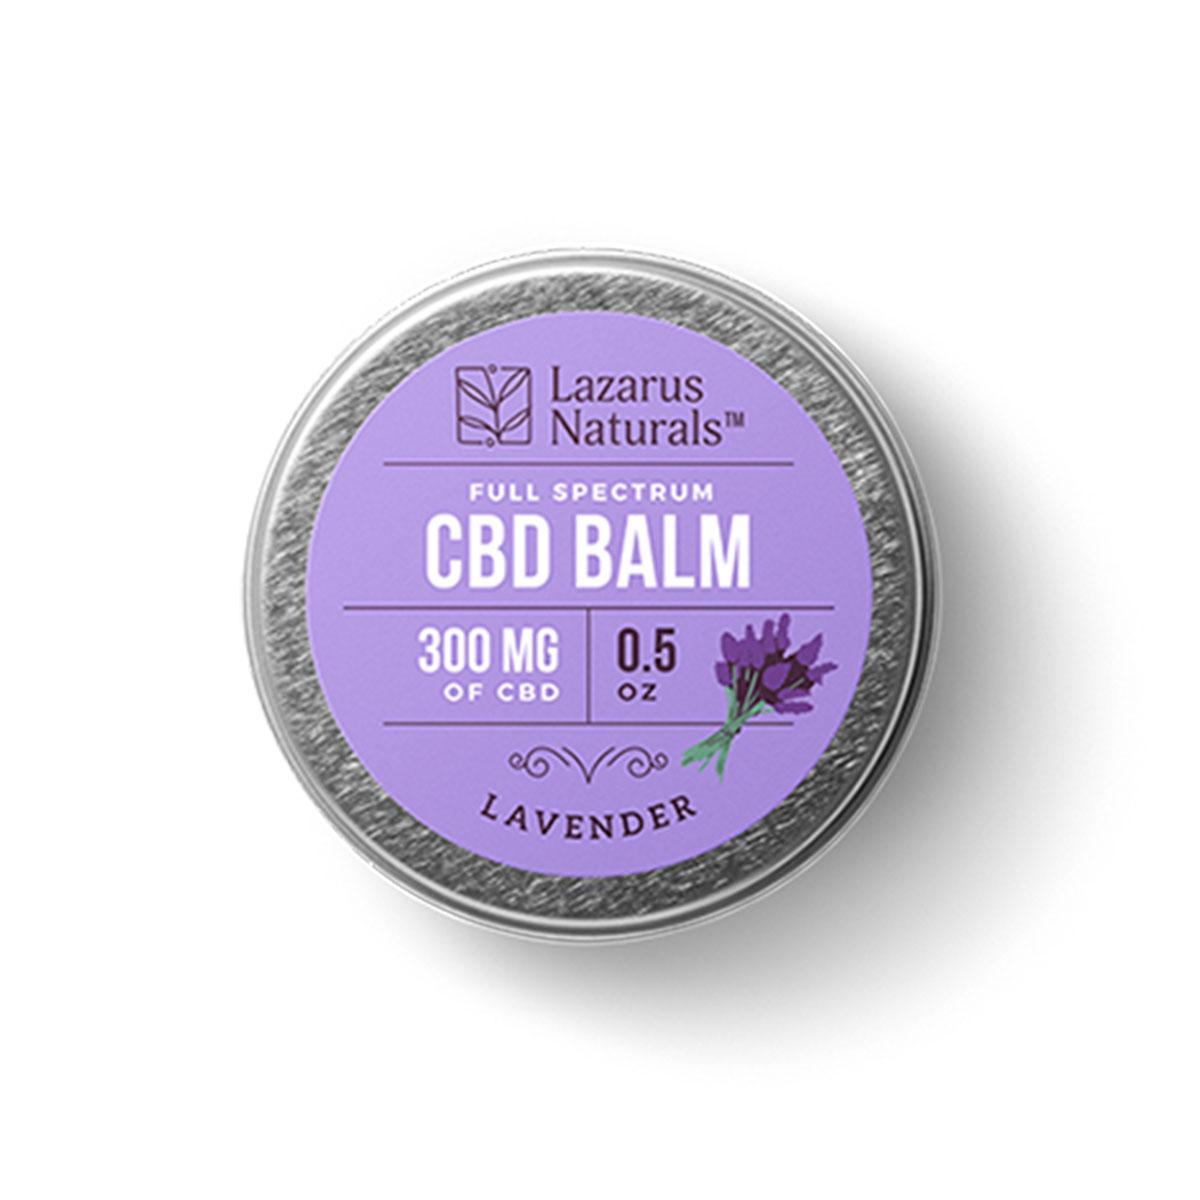 Lazarus-Naturals,-Lavender-CBD-Balm,-Full-Spectrum,-0.5oz,-300mg-of-CBD